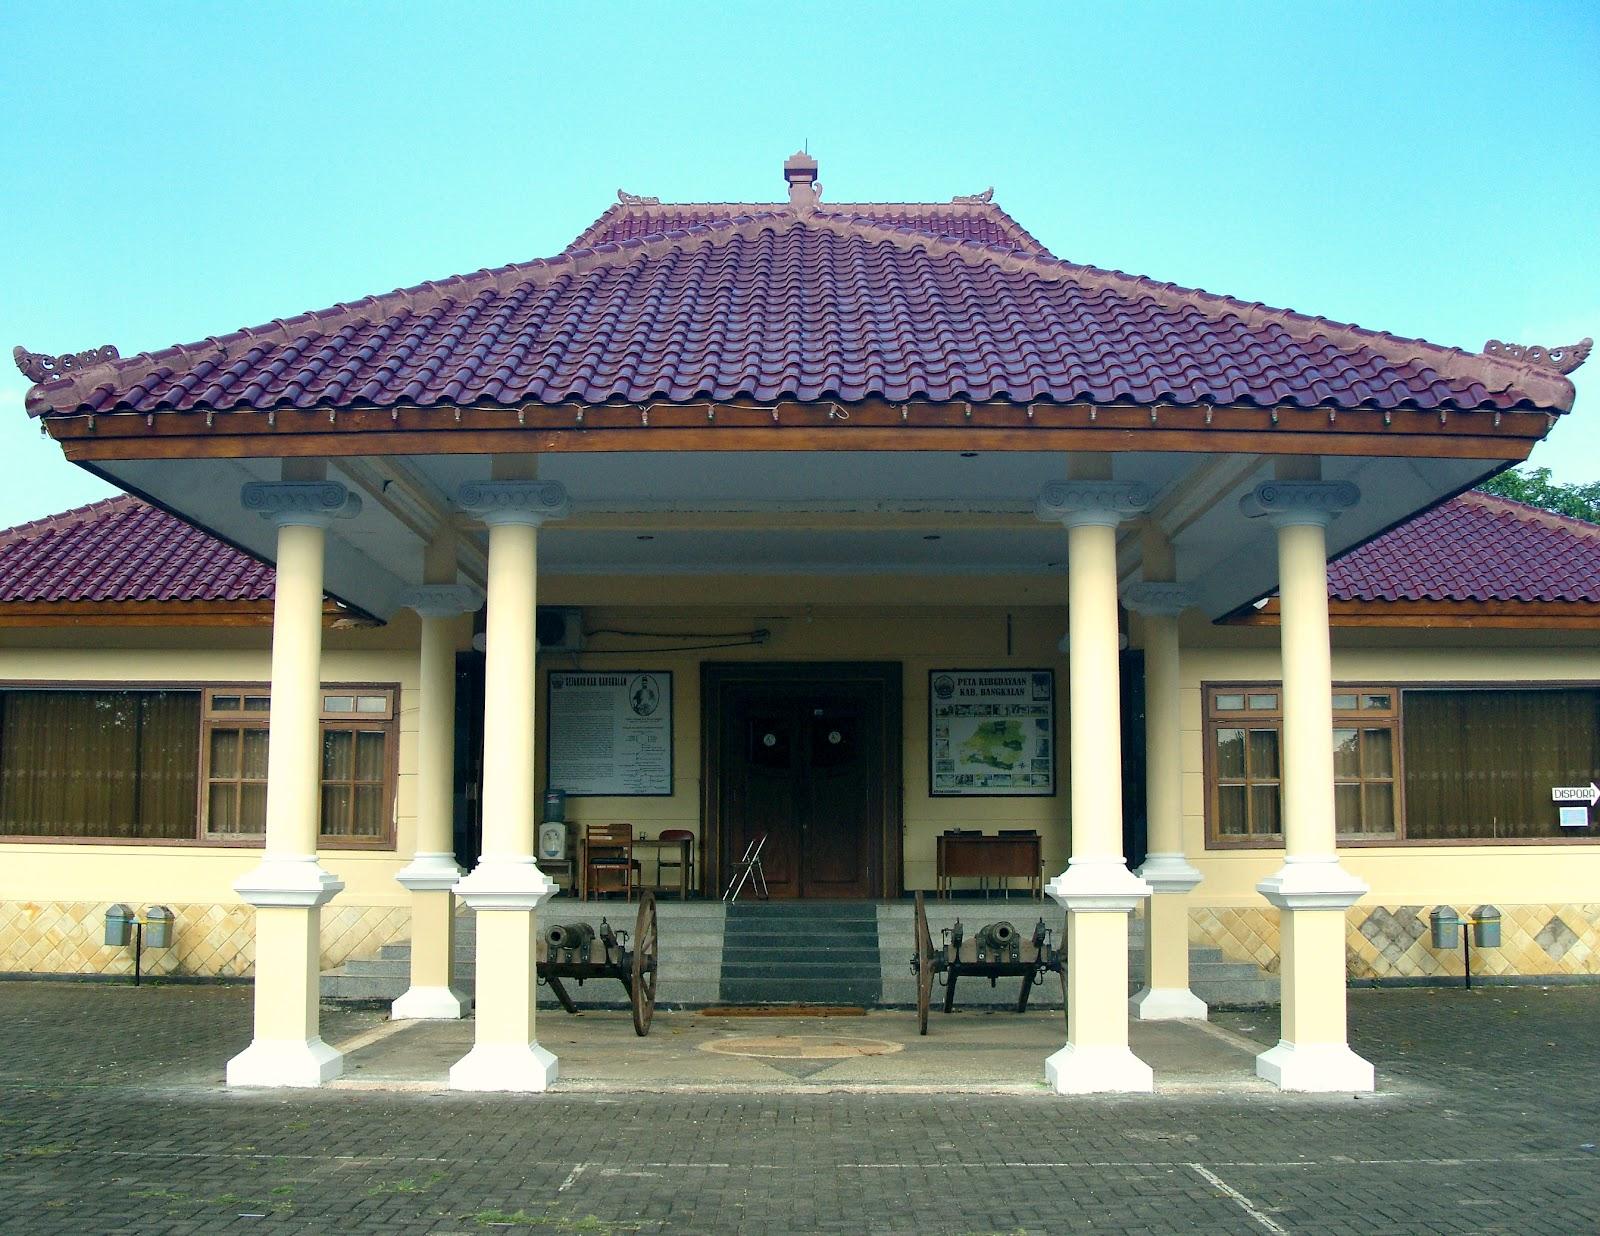 Wisata Sejarah Museum Cakraningrat Bangkalan Madura Gerbang Tampak Depan Gedung